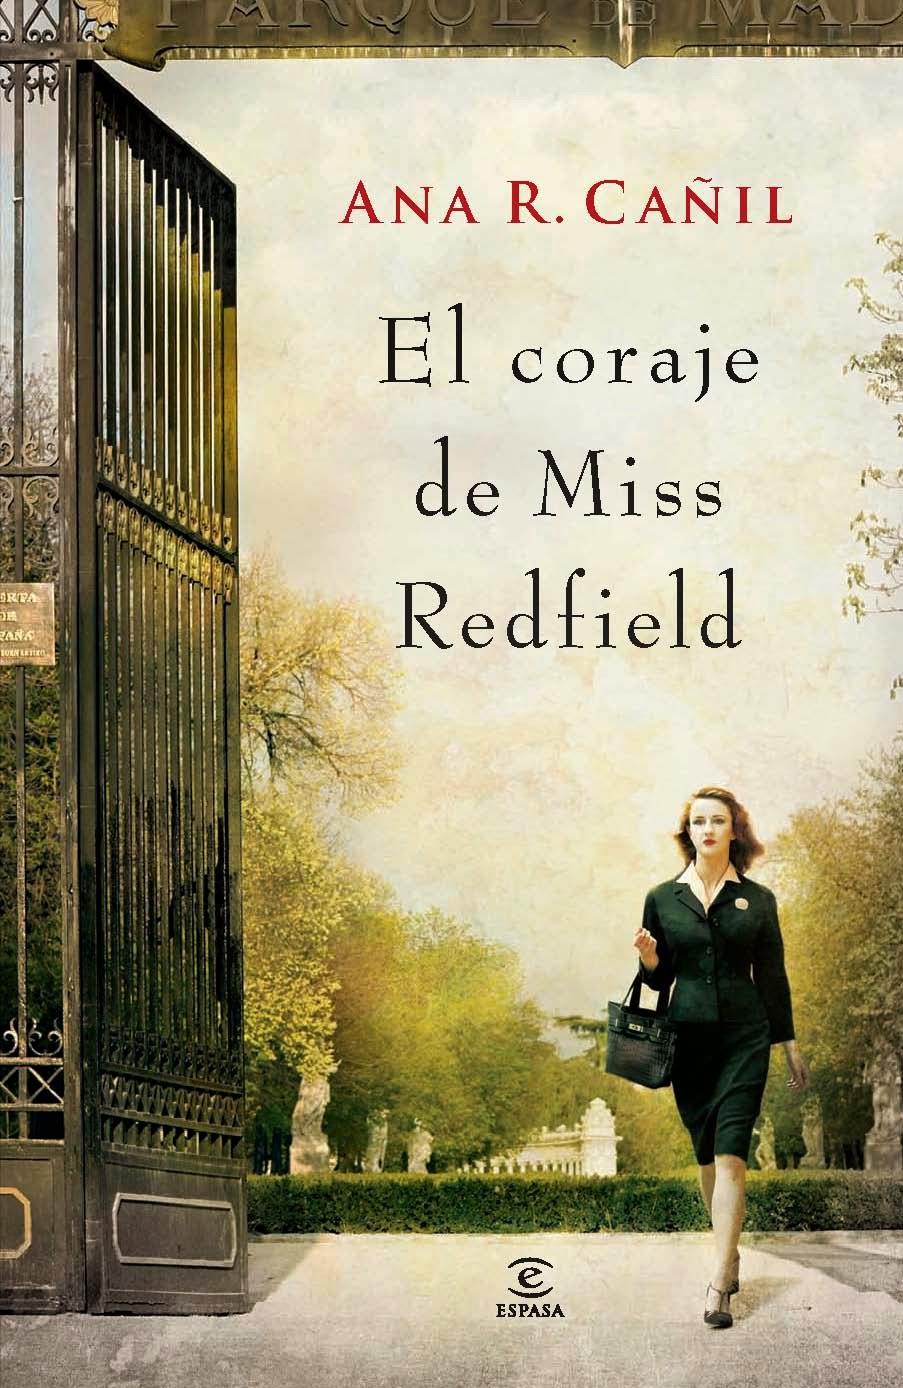 El coraje de Miss Redfield - Ana R. Cañil (2012)